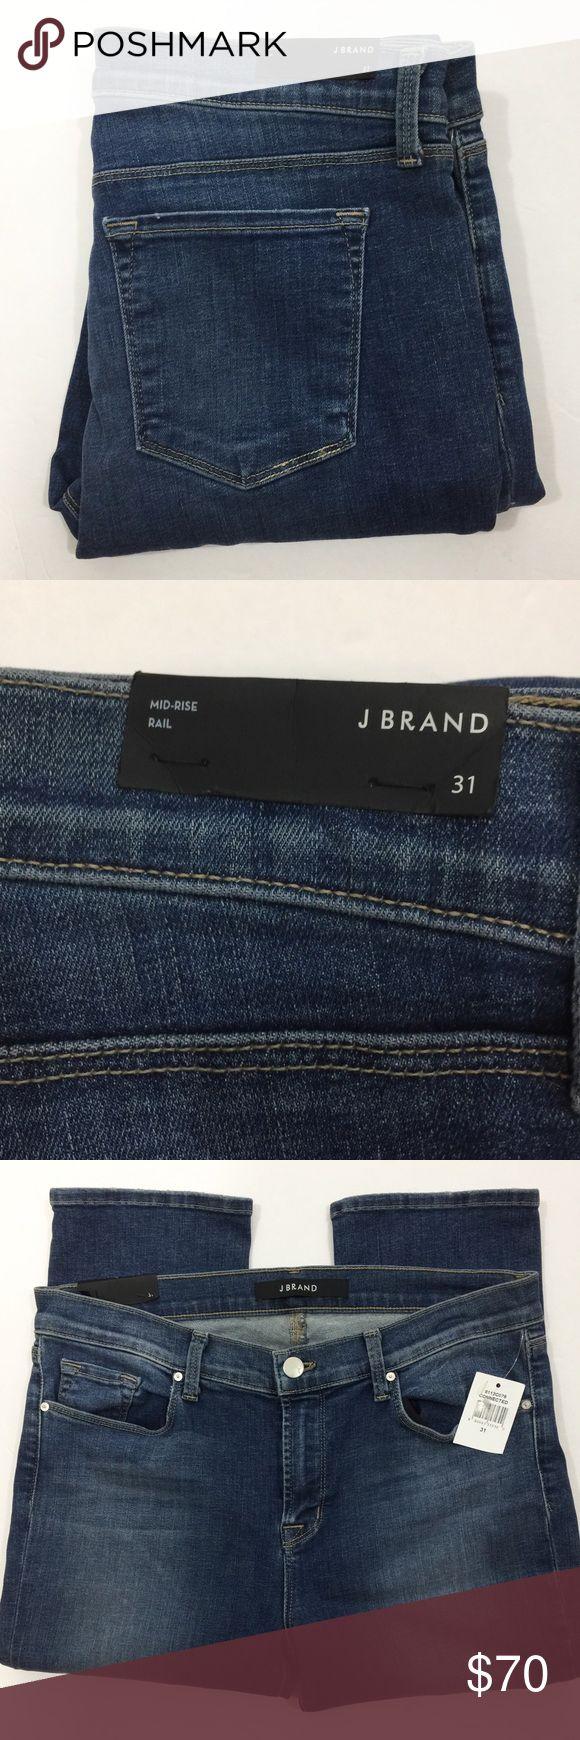 "J BRAND MID RISE 8112 RAIL SKINNY JEANS 32"" inseam. 9"" rise. 14"" back rise. Five pocket style. J Brand Jeans Skinny"